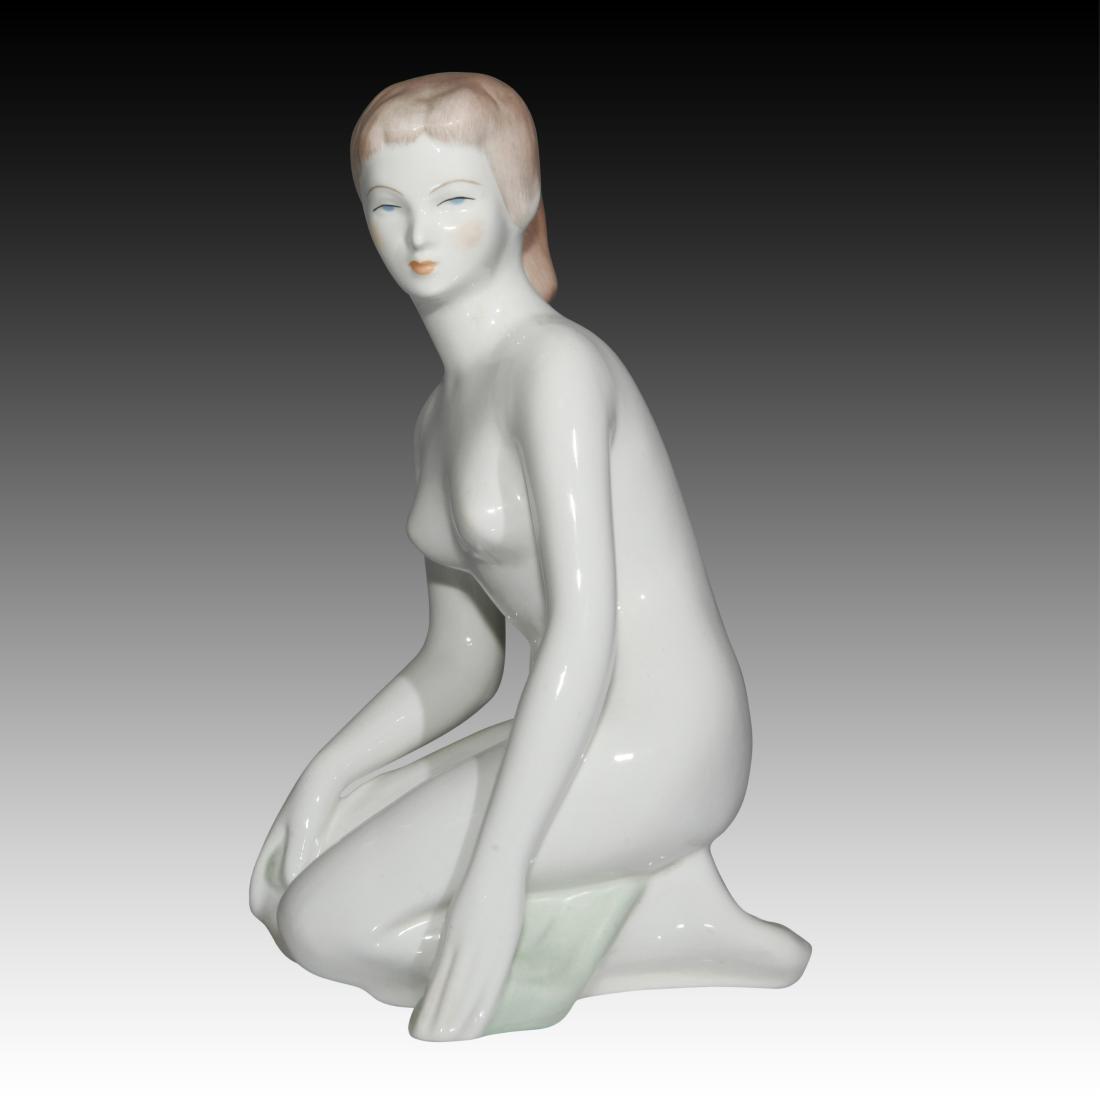 Budapest Aquincum Nude Female Figurine